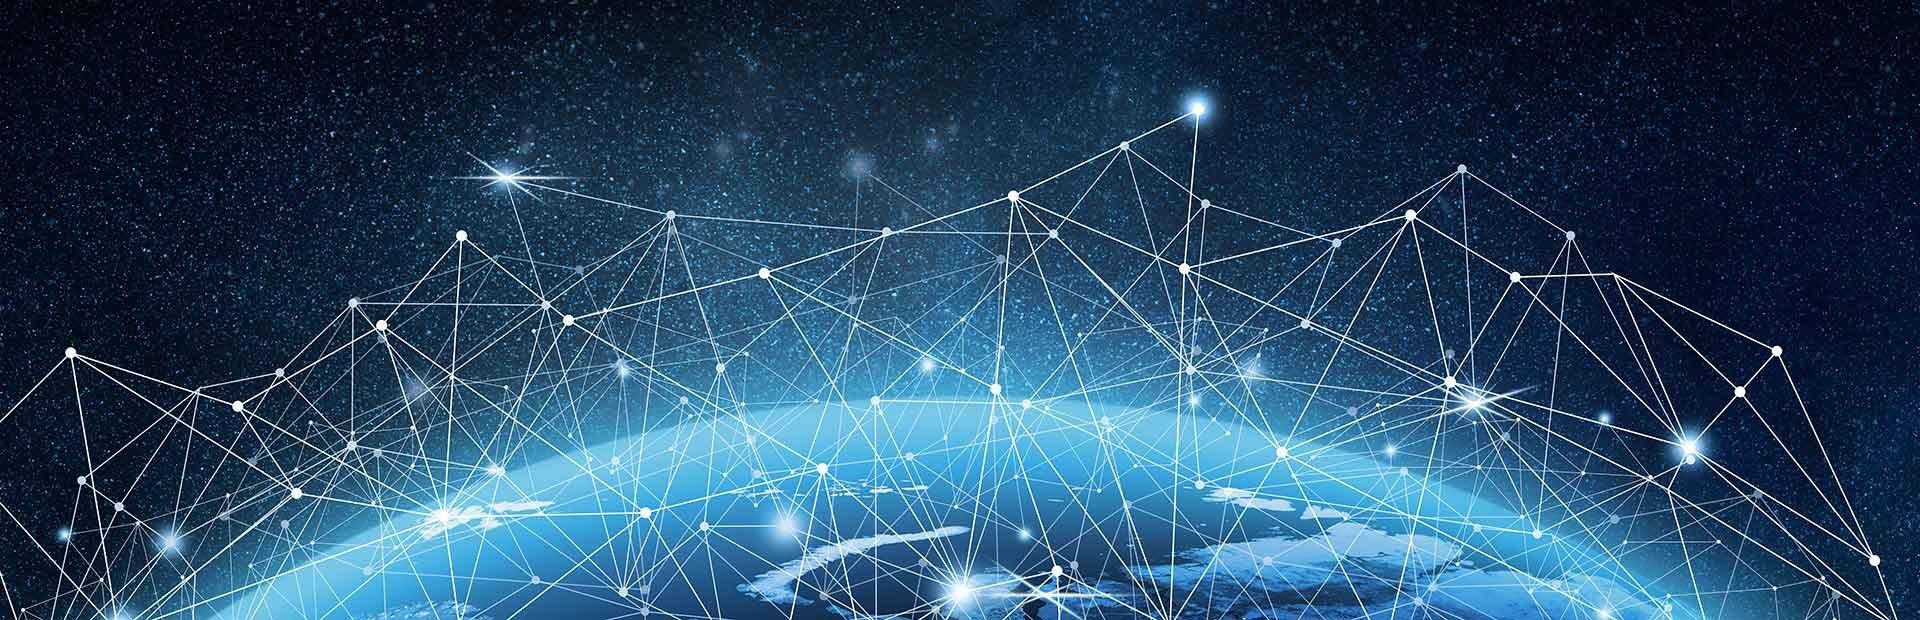 Cisco Technologieradar Case Study